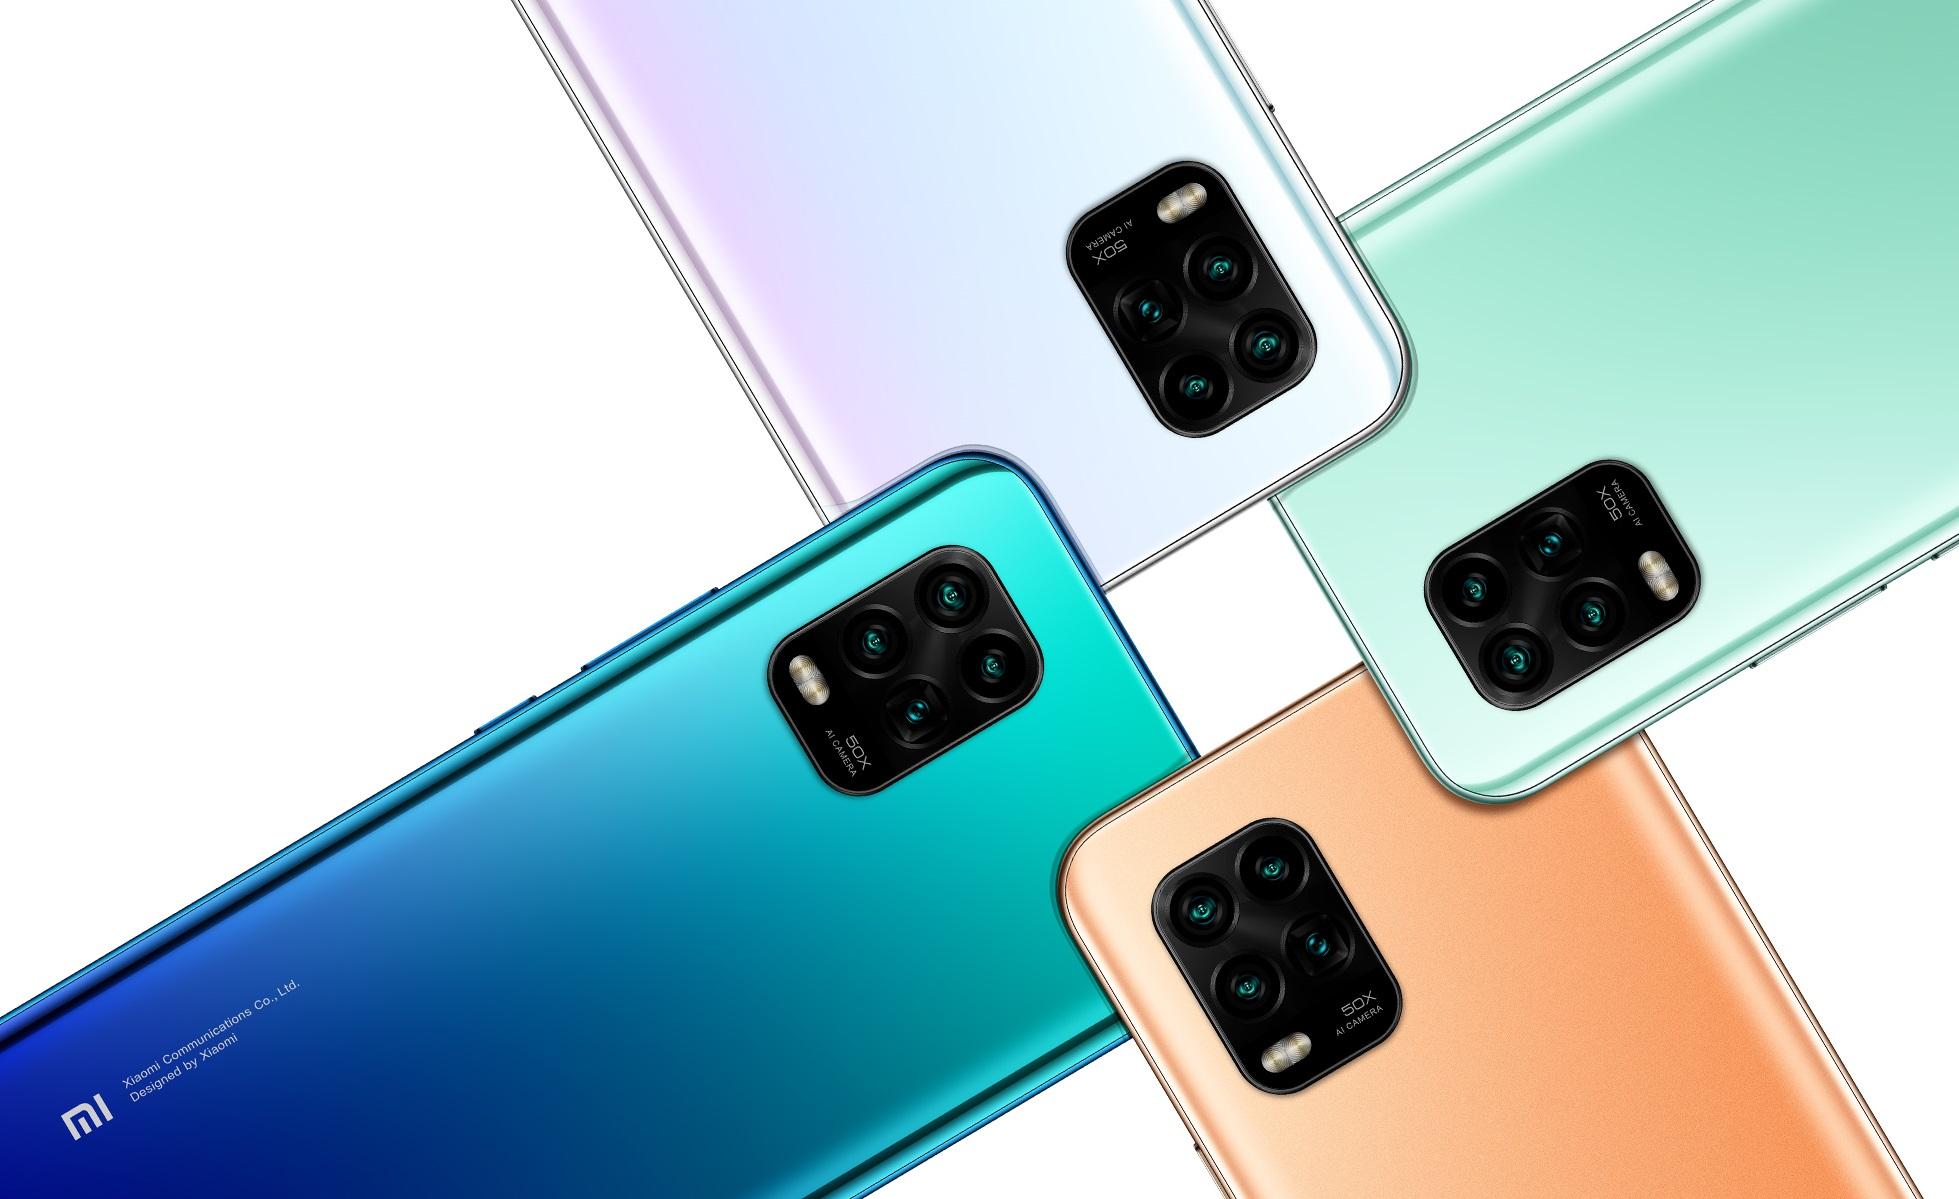 Xiaomi Mi 10 Youth Edition 5G smartphone